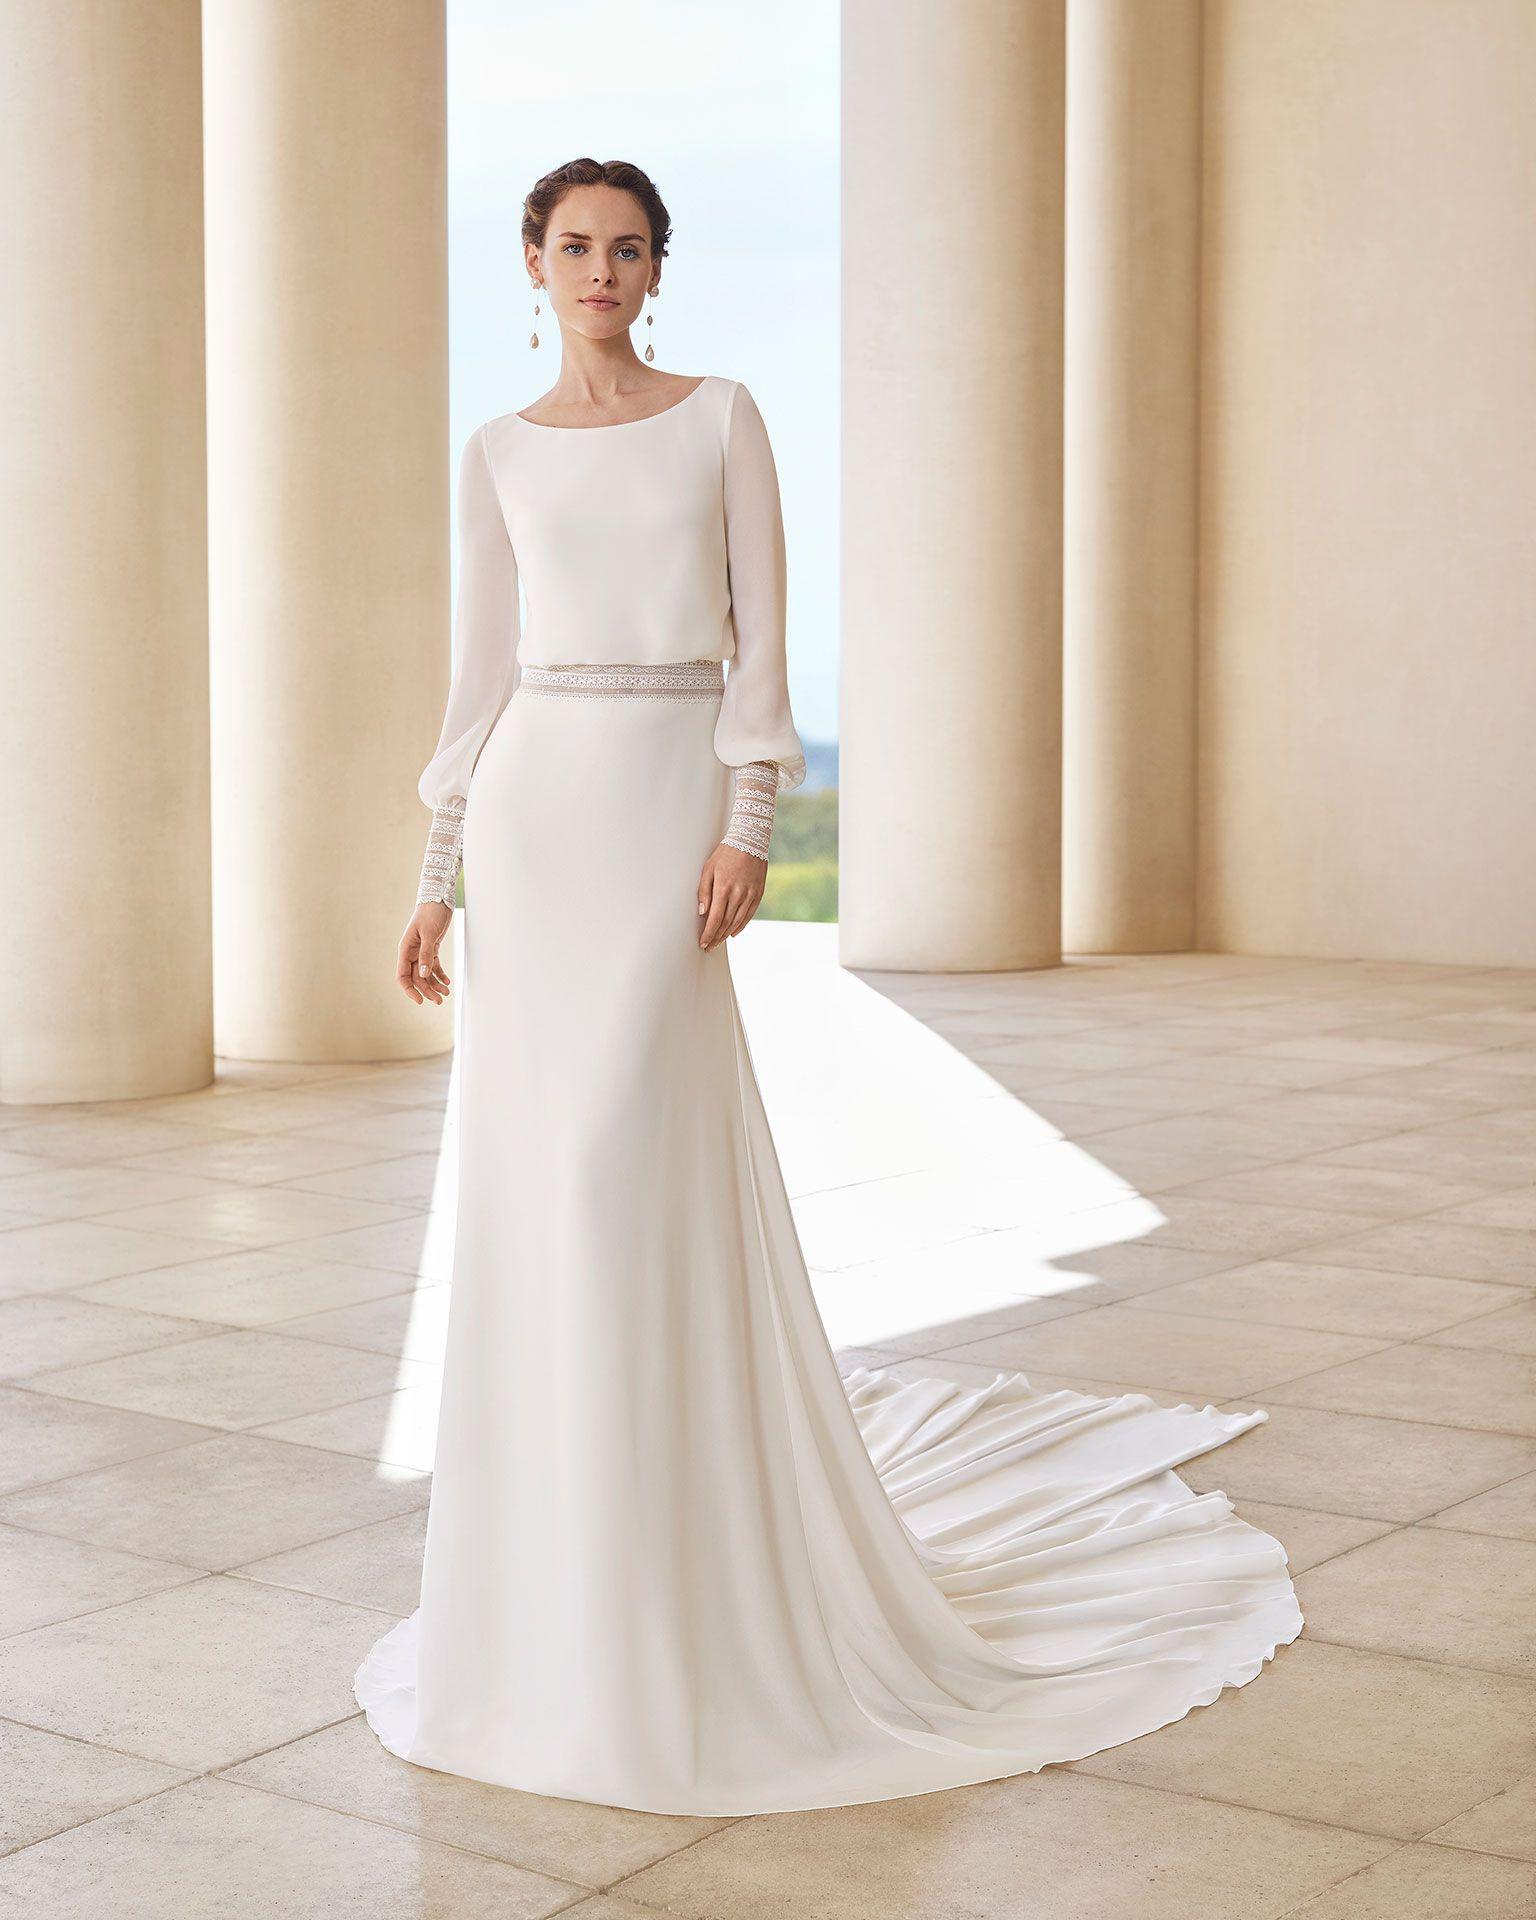 Sahel Bridal 2020 Rosa Clara Couture Collection Muslim Wedding Dresses Gothic Wedding Dress Wedding Dress Long Sleeve